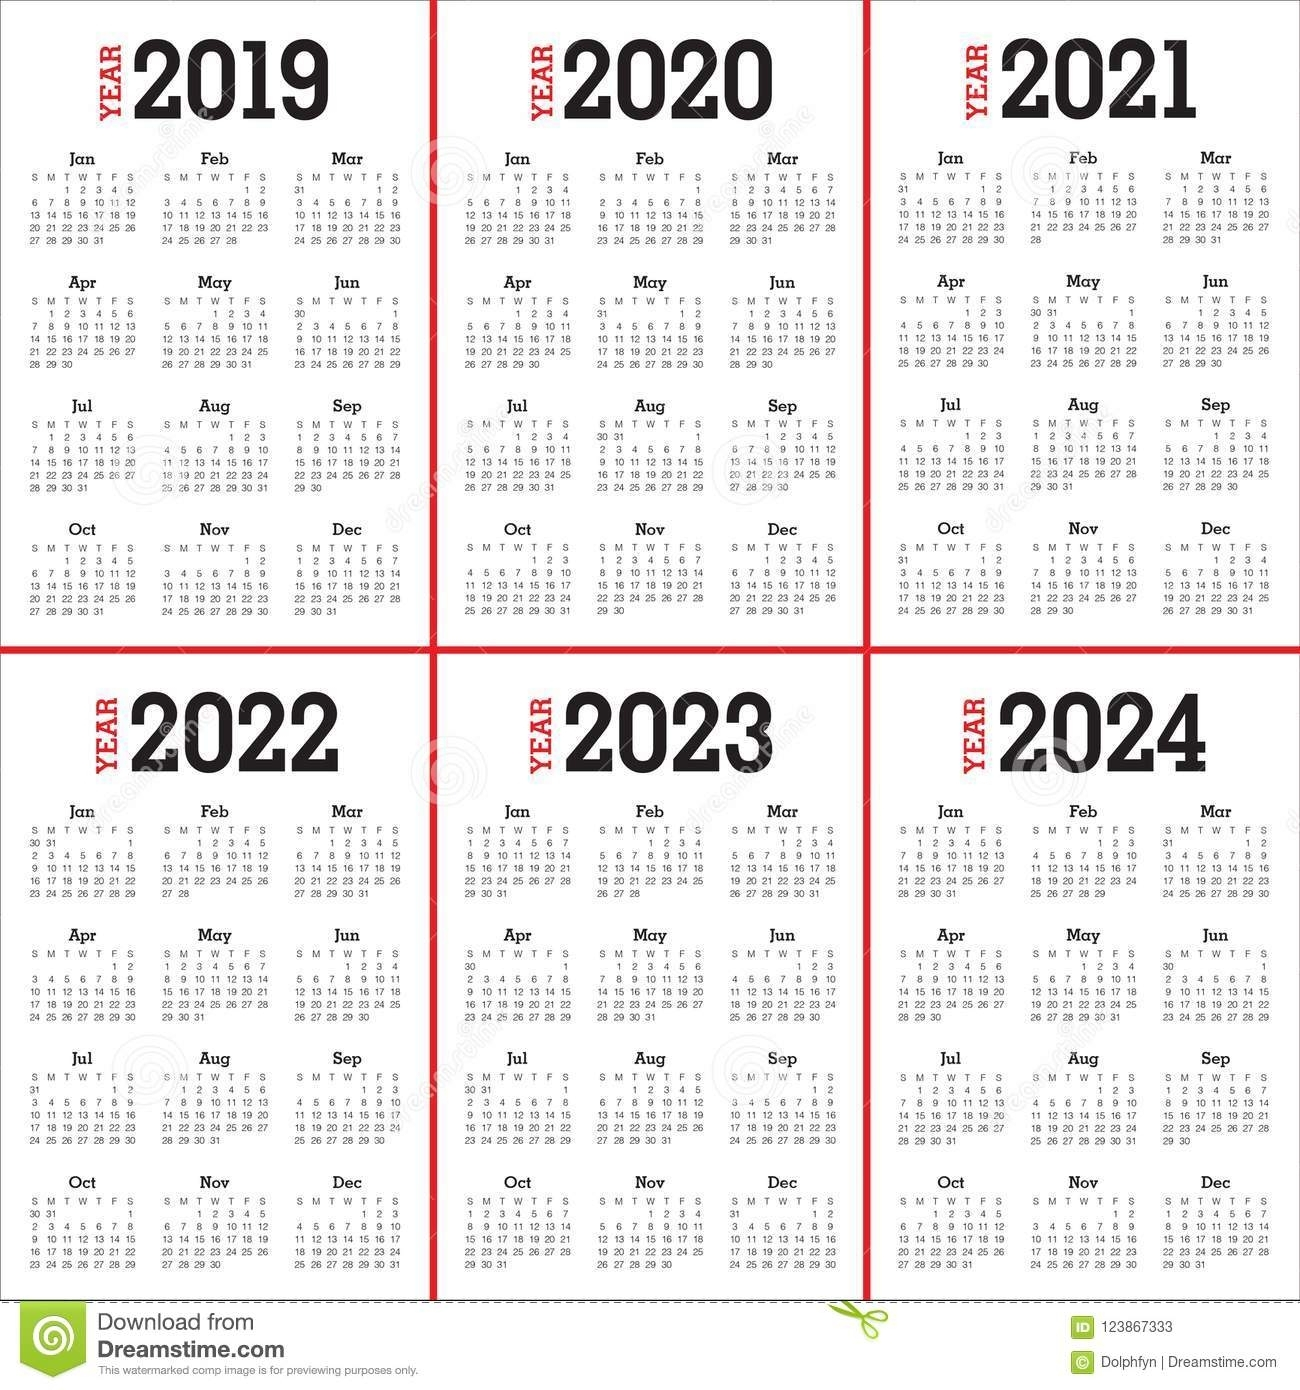 Year 2019 2020 2021 2022 2023 2024 Calendar Vector Design Template within Calendar Yearly 2019 2020 2021